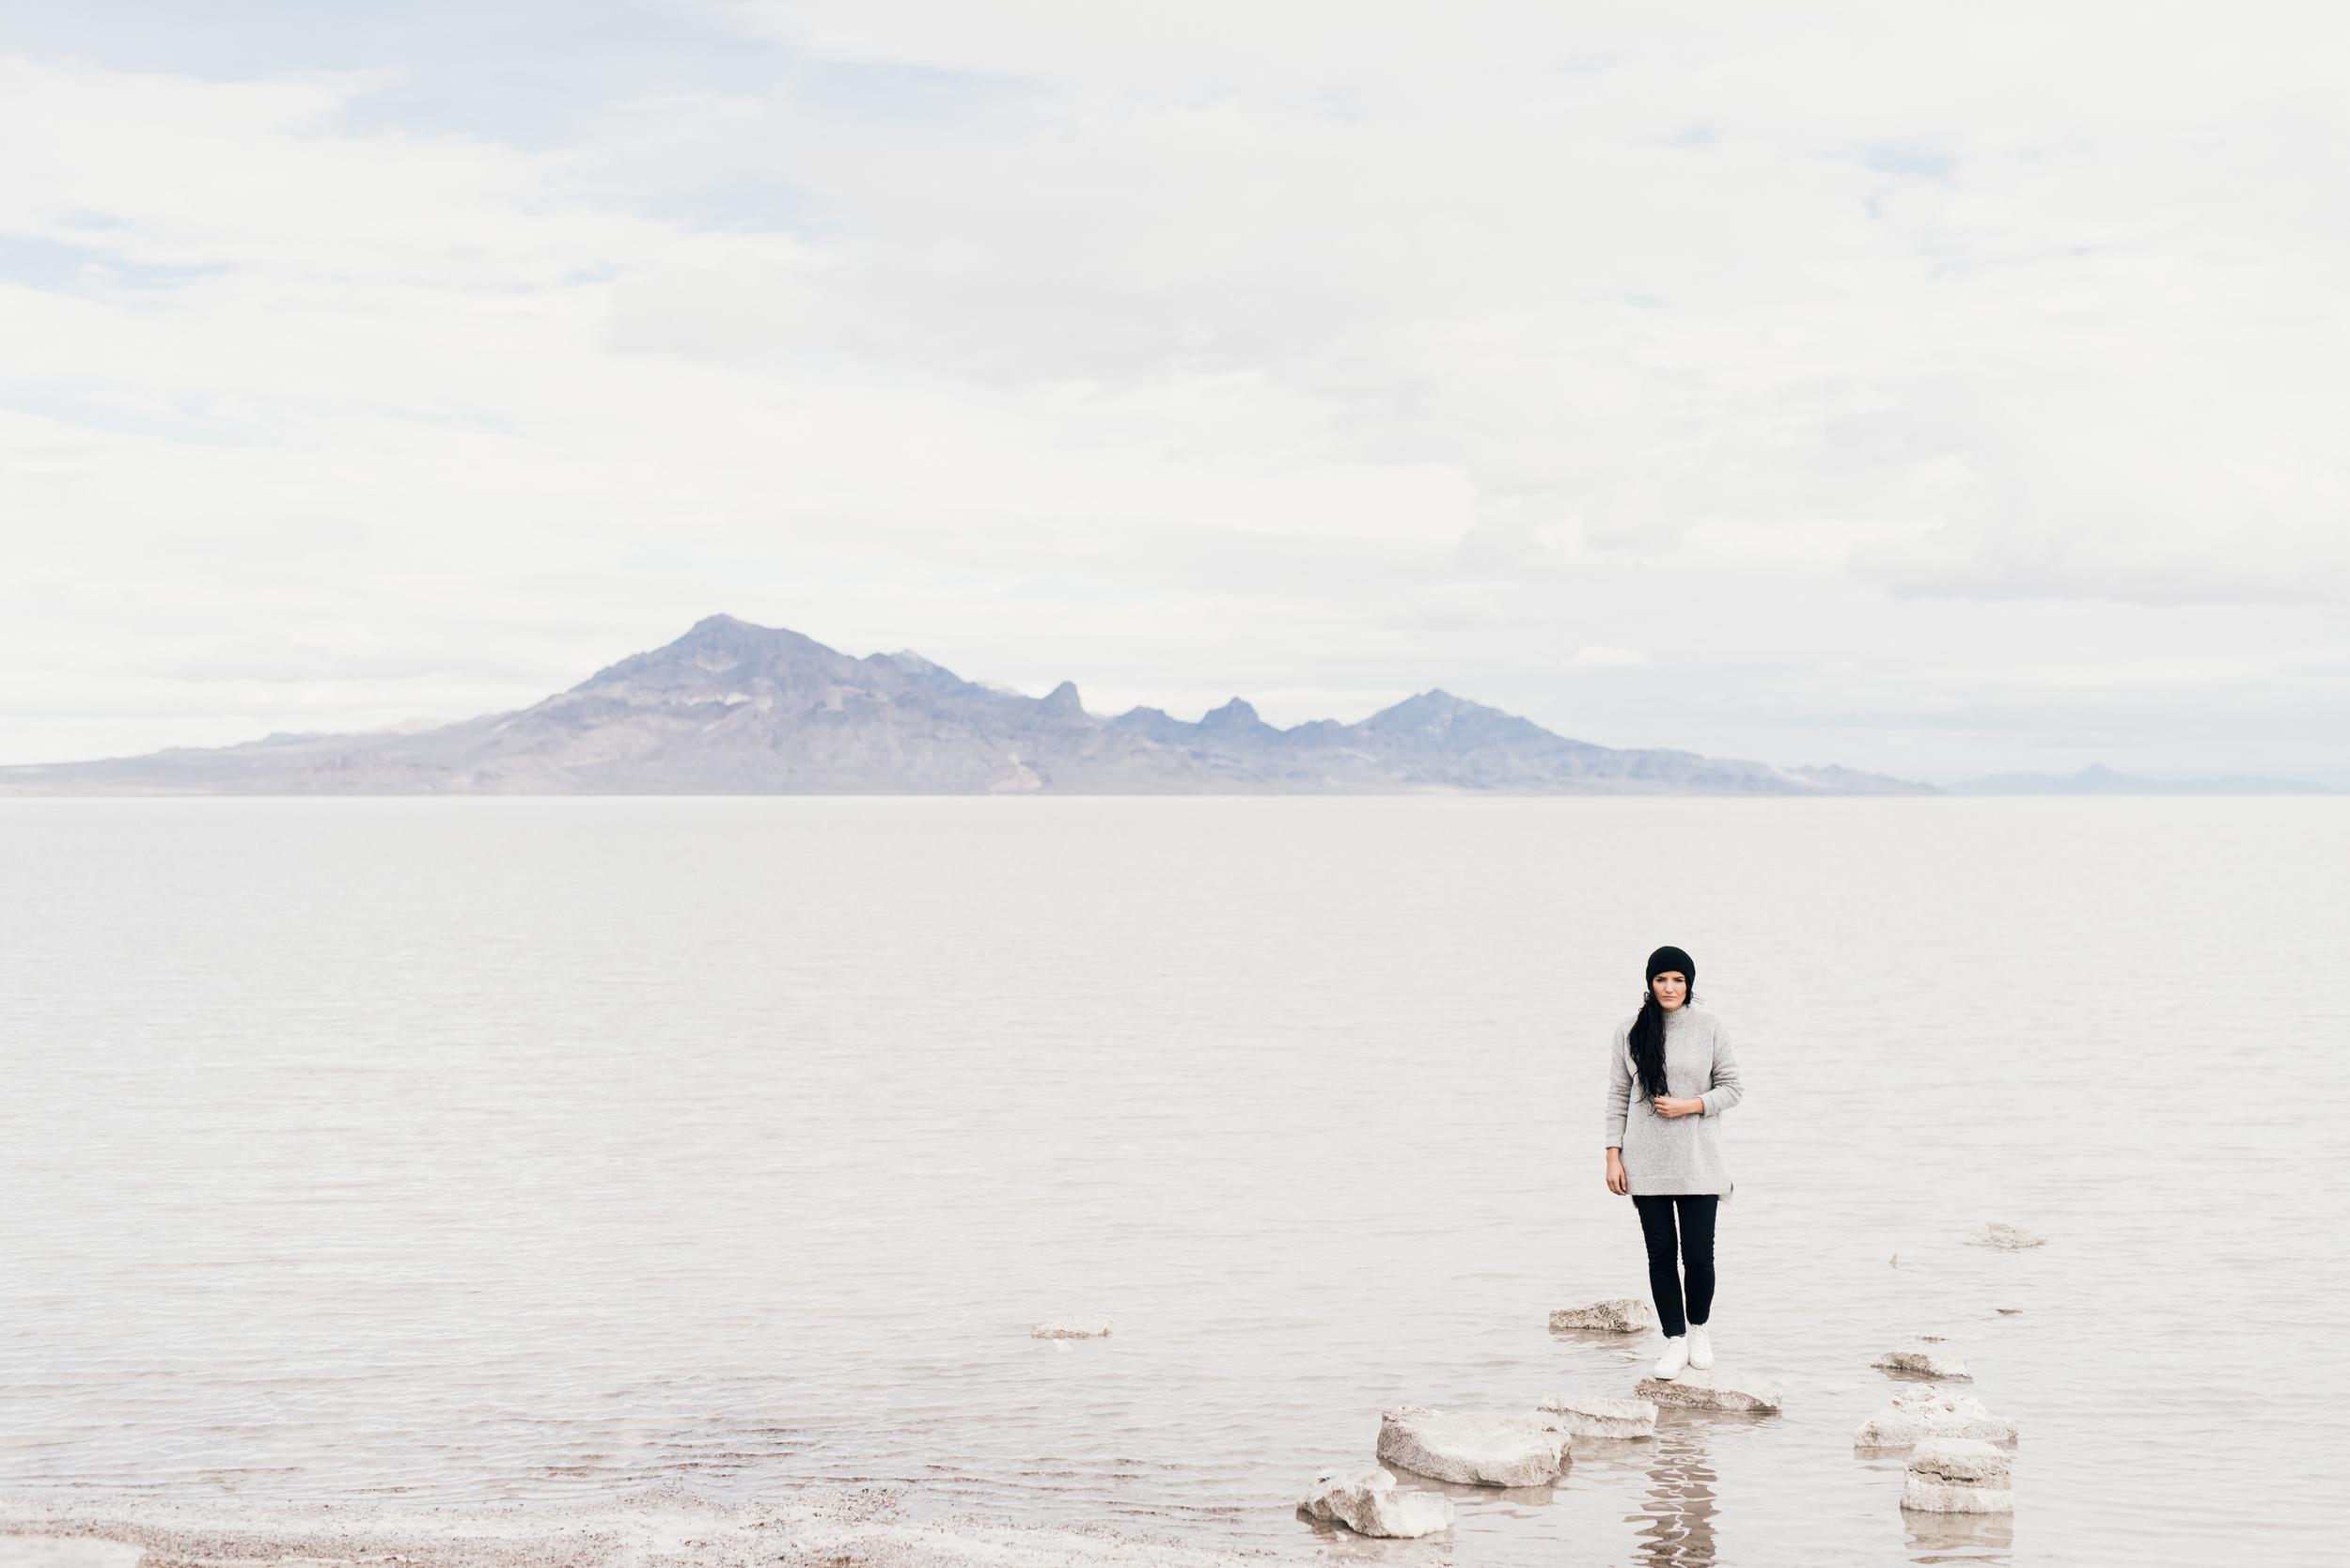 ©The_Ryans_Photography_-_Bonneville_Salt_Flats_Adventure-034.jpg